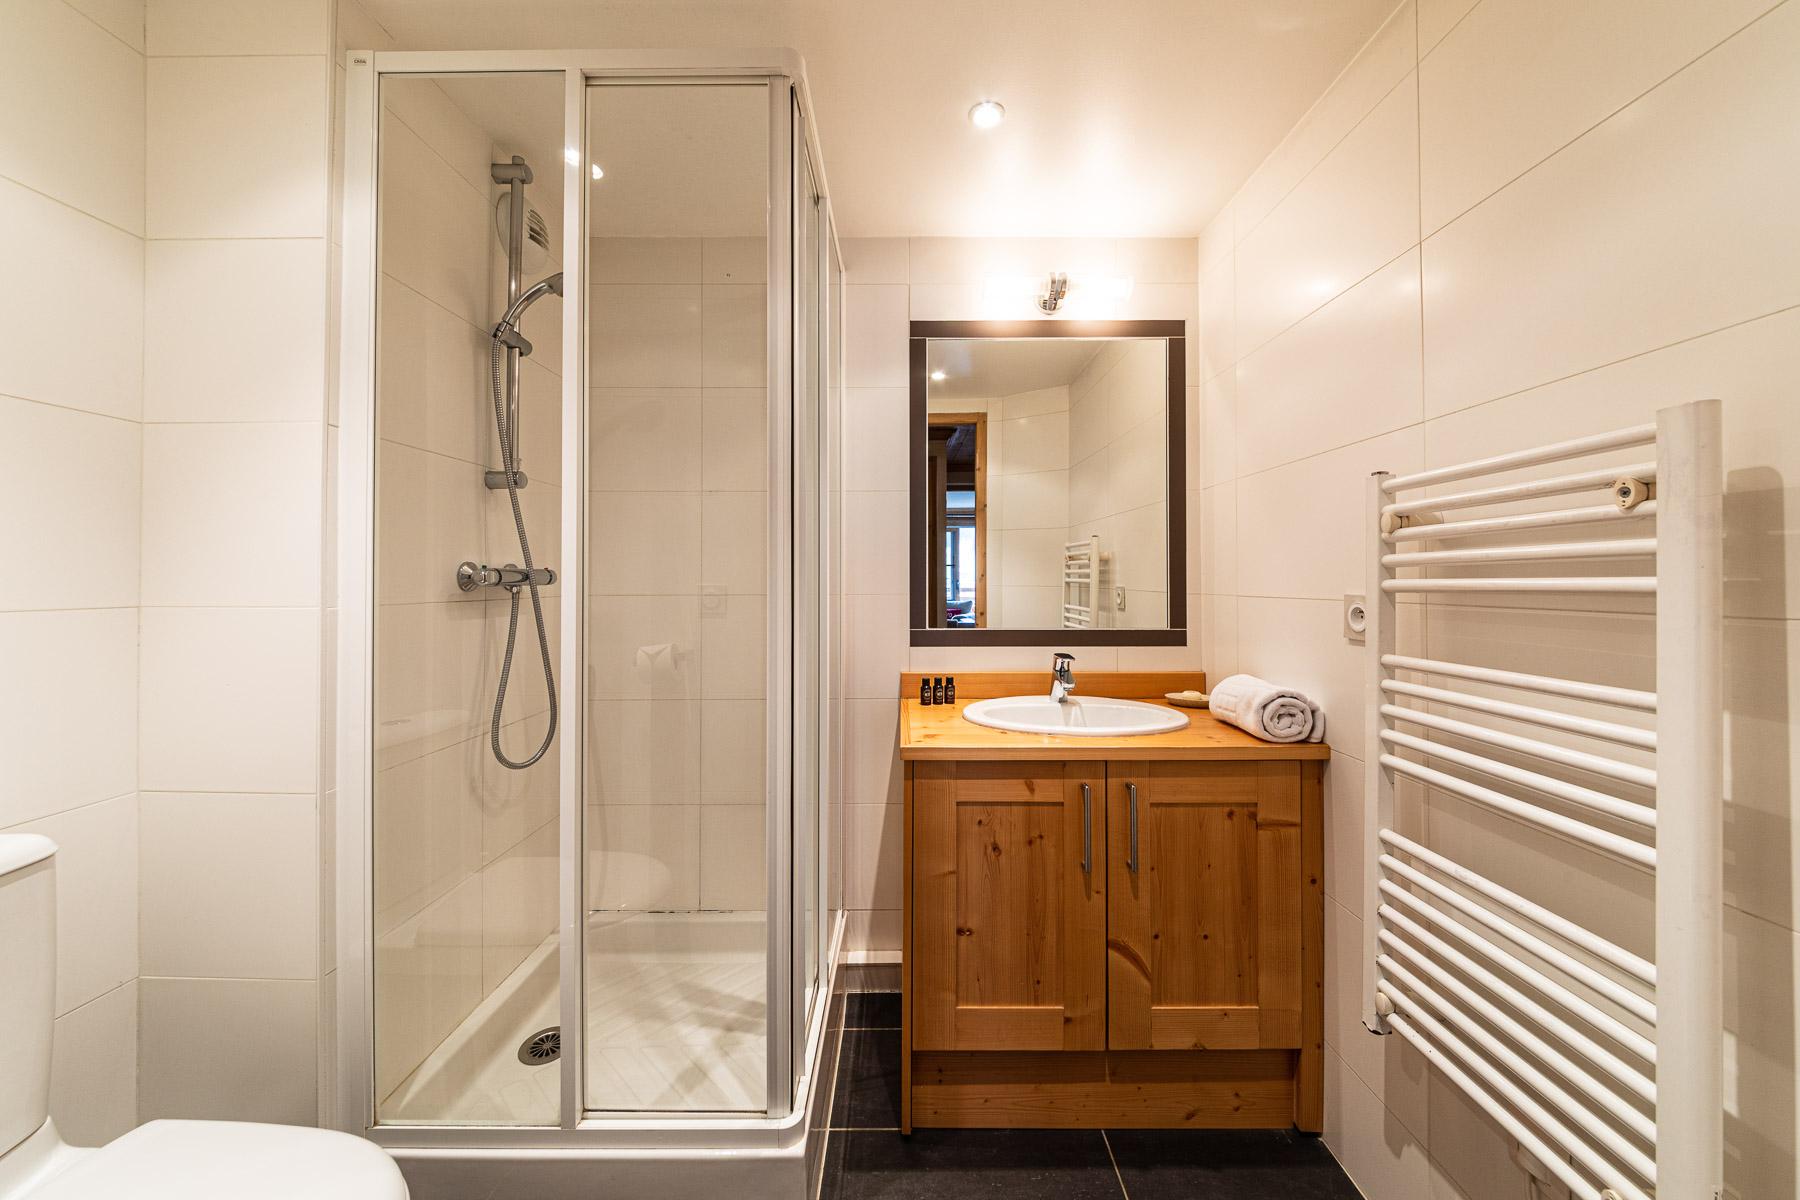 Bois Venants Appt 295 Shower Room